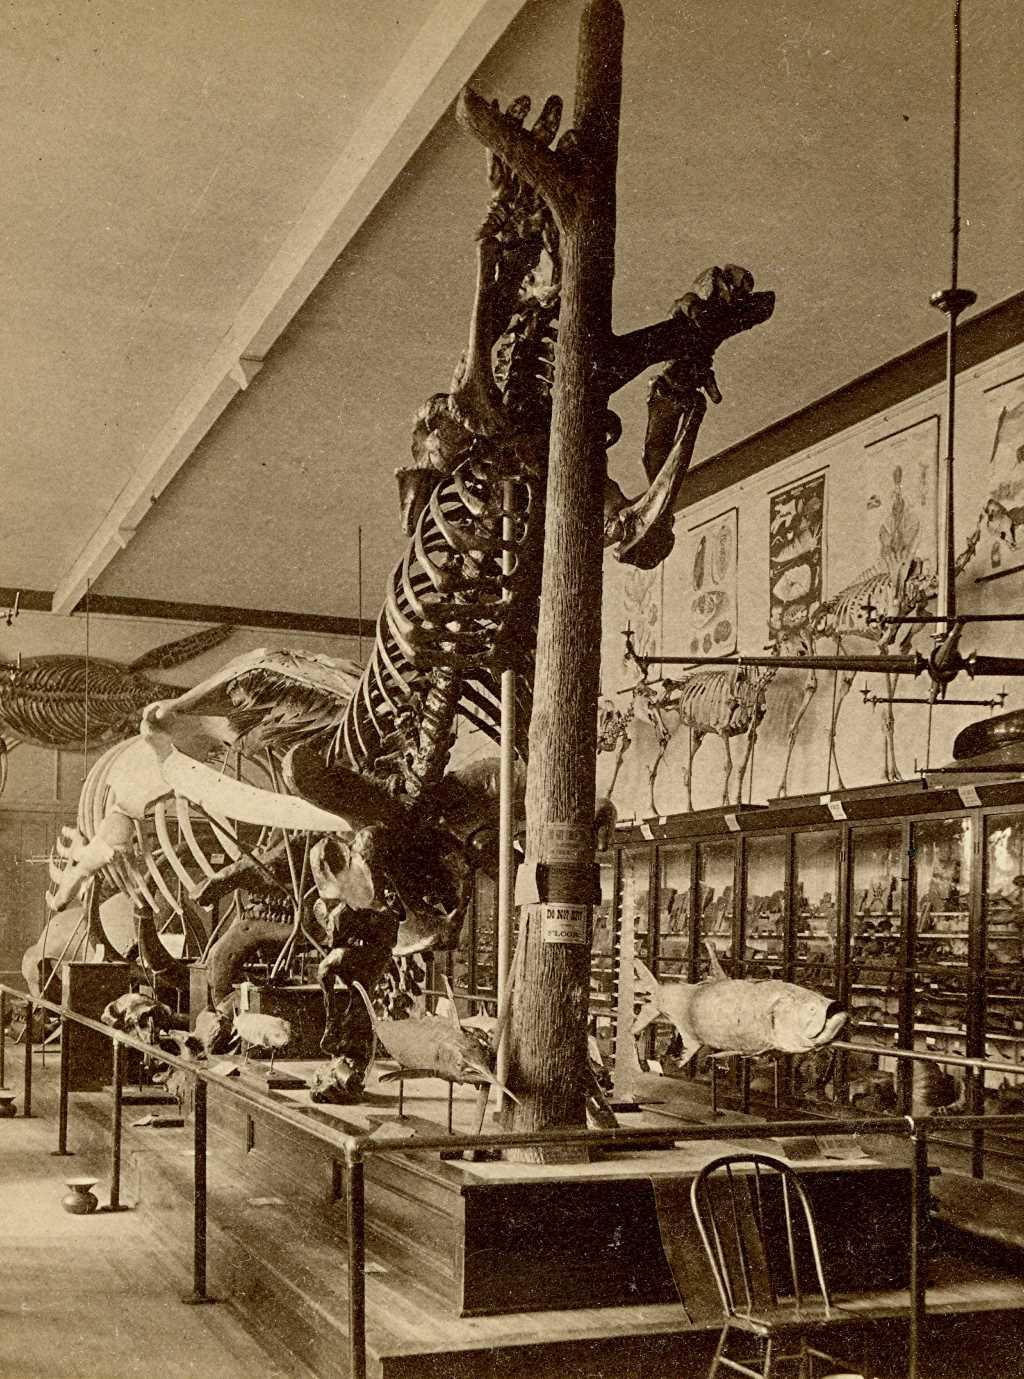 Public Museum Exhibit, 1880s. Image courtesy of Jeff Beutner.